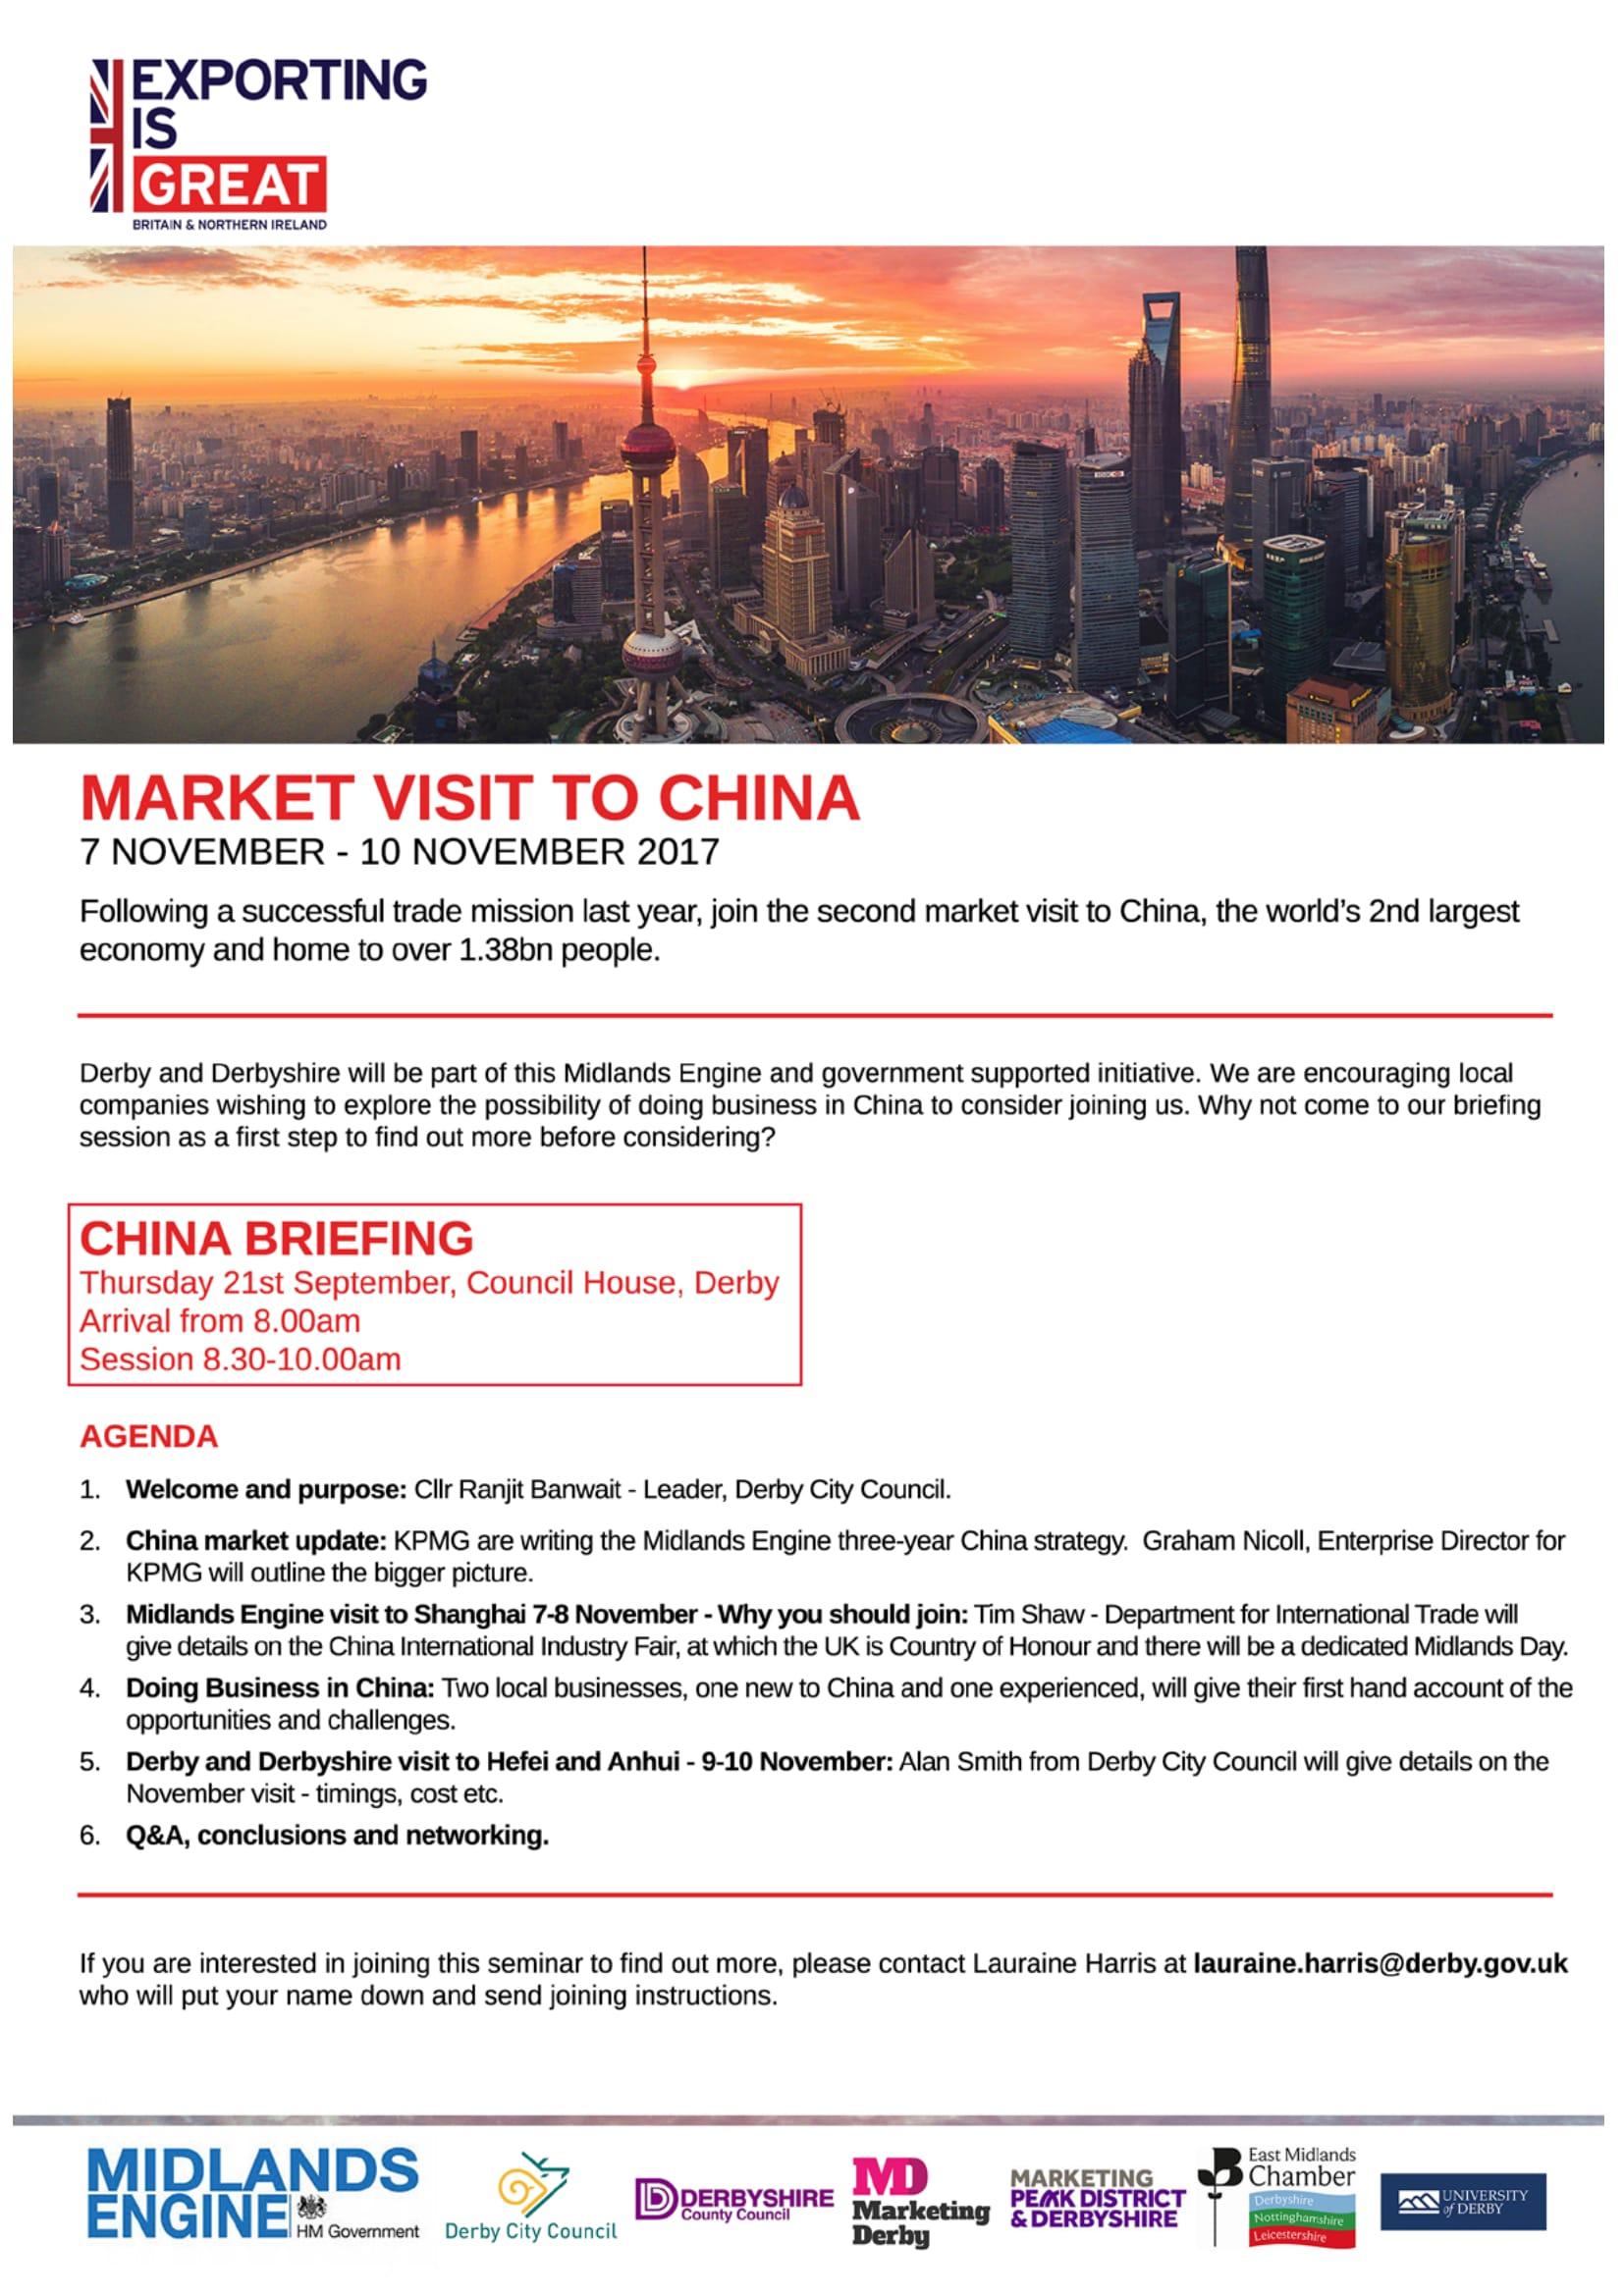 Chinese Midlands Engine Briefing Invitation-1.jpg